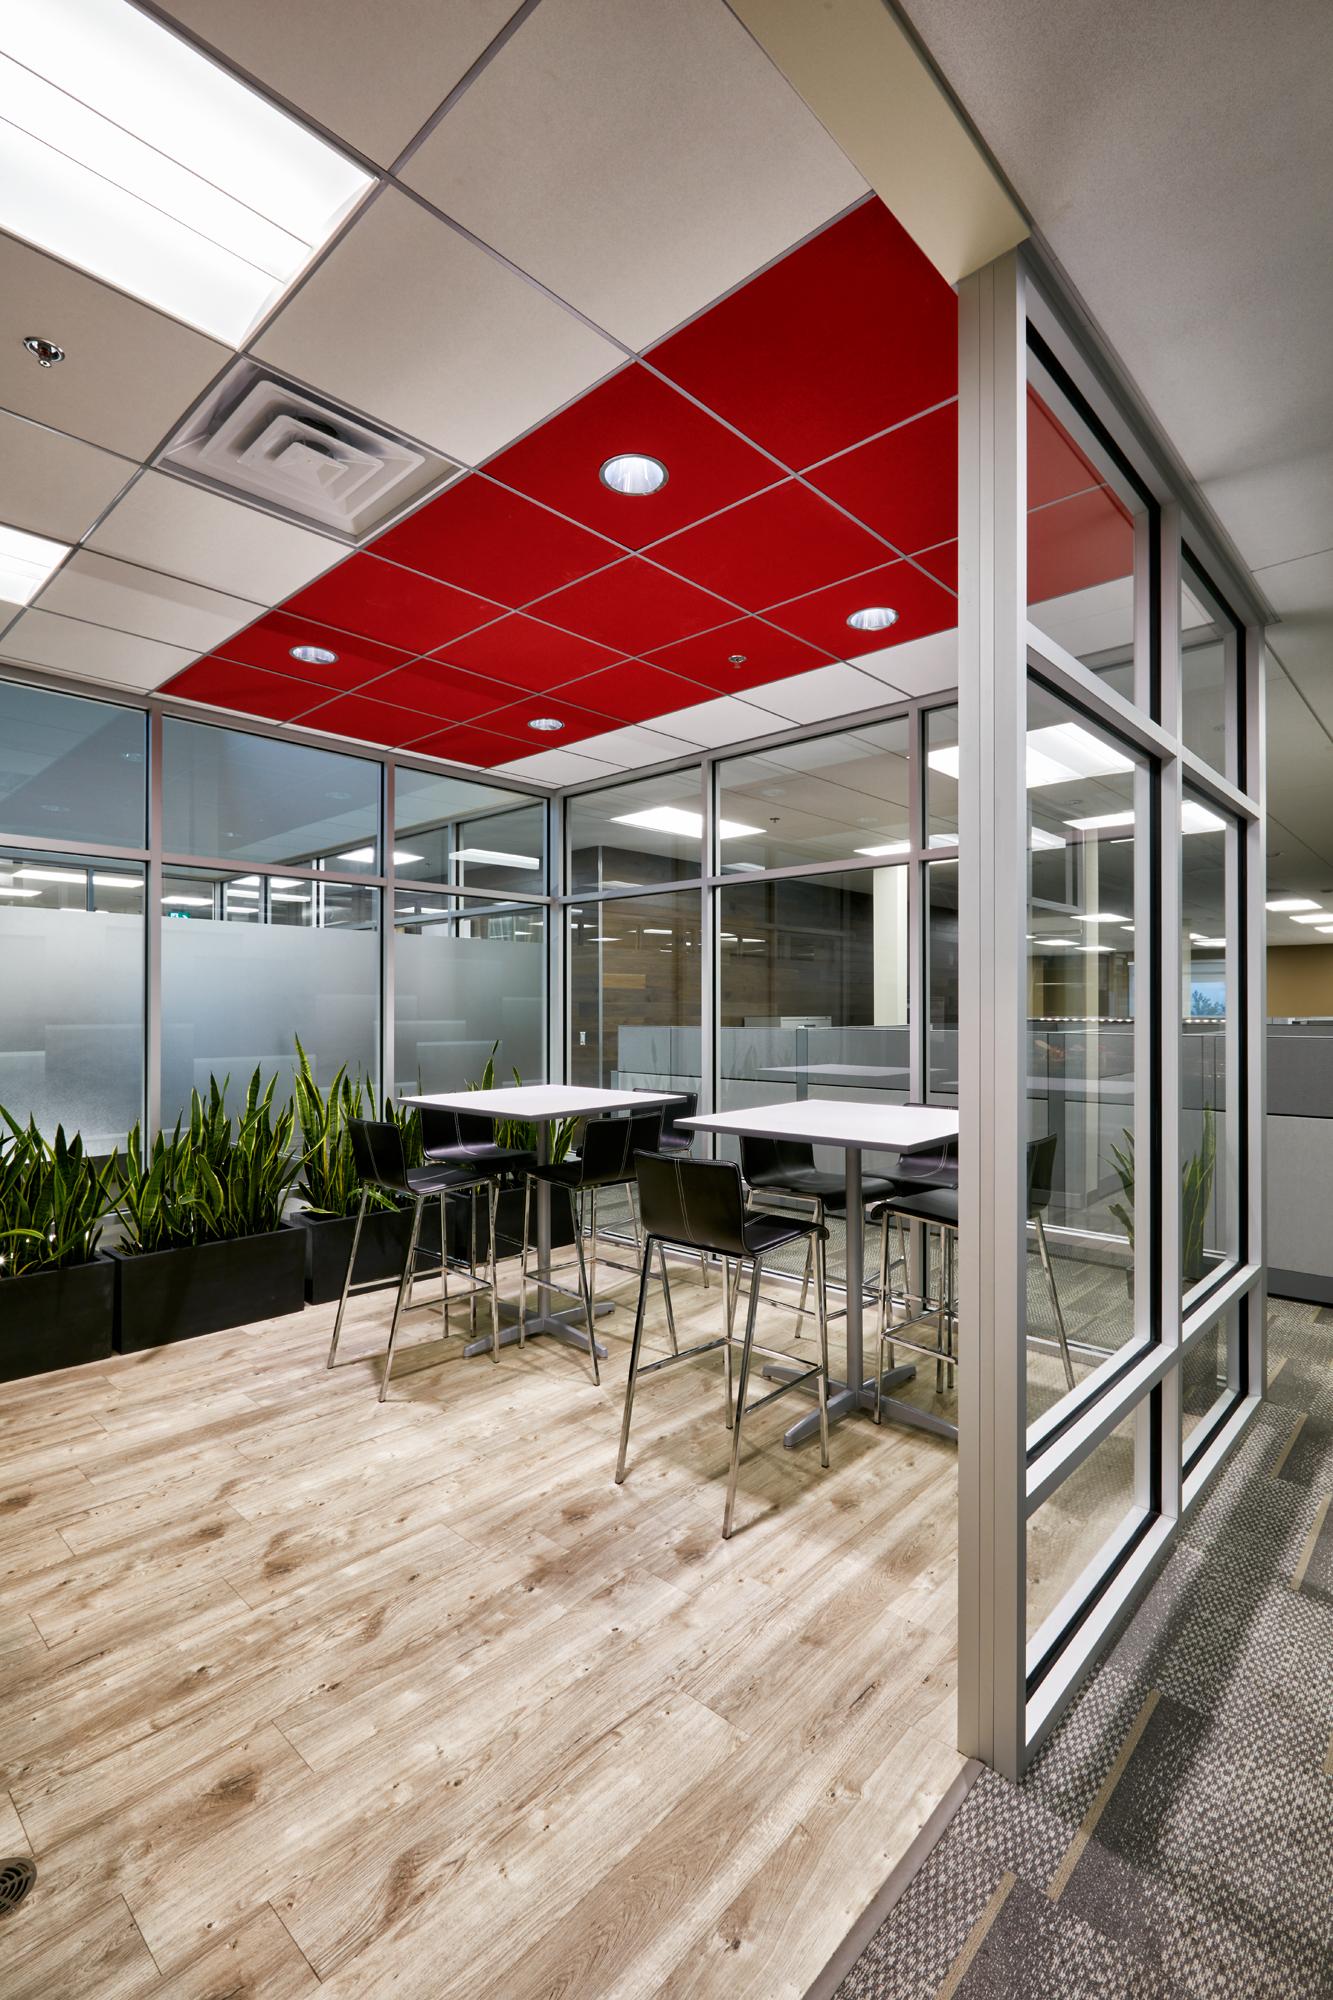 Office ceiling tile